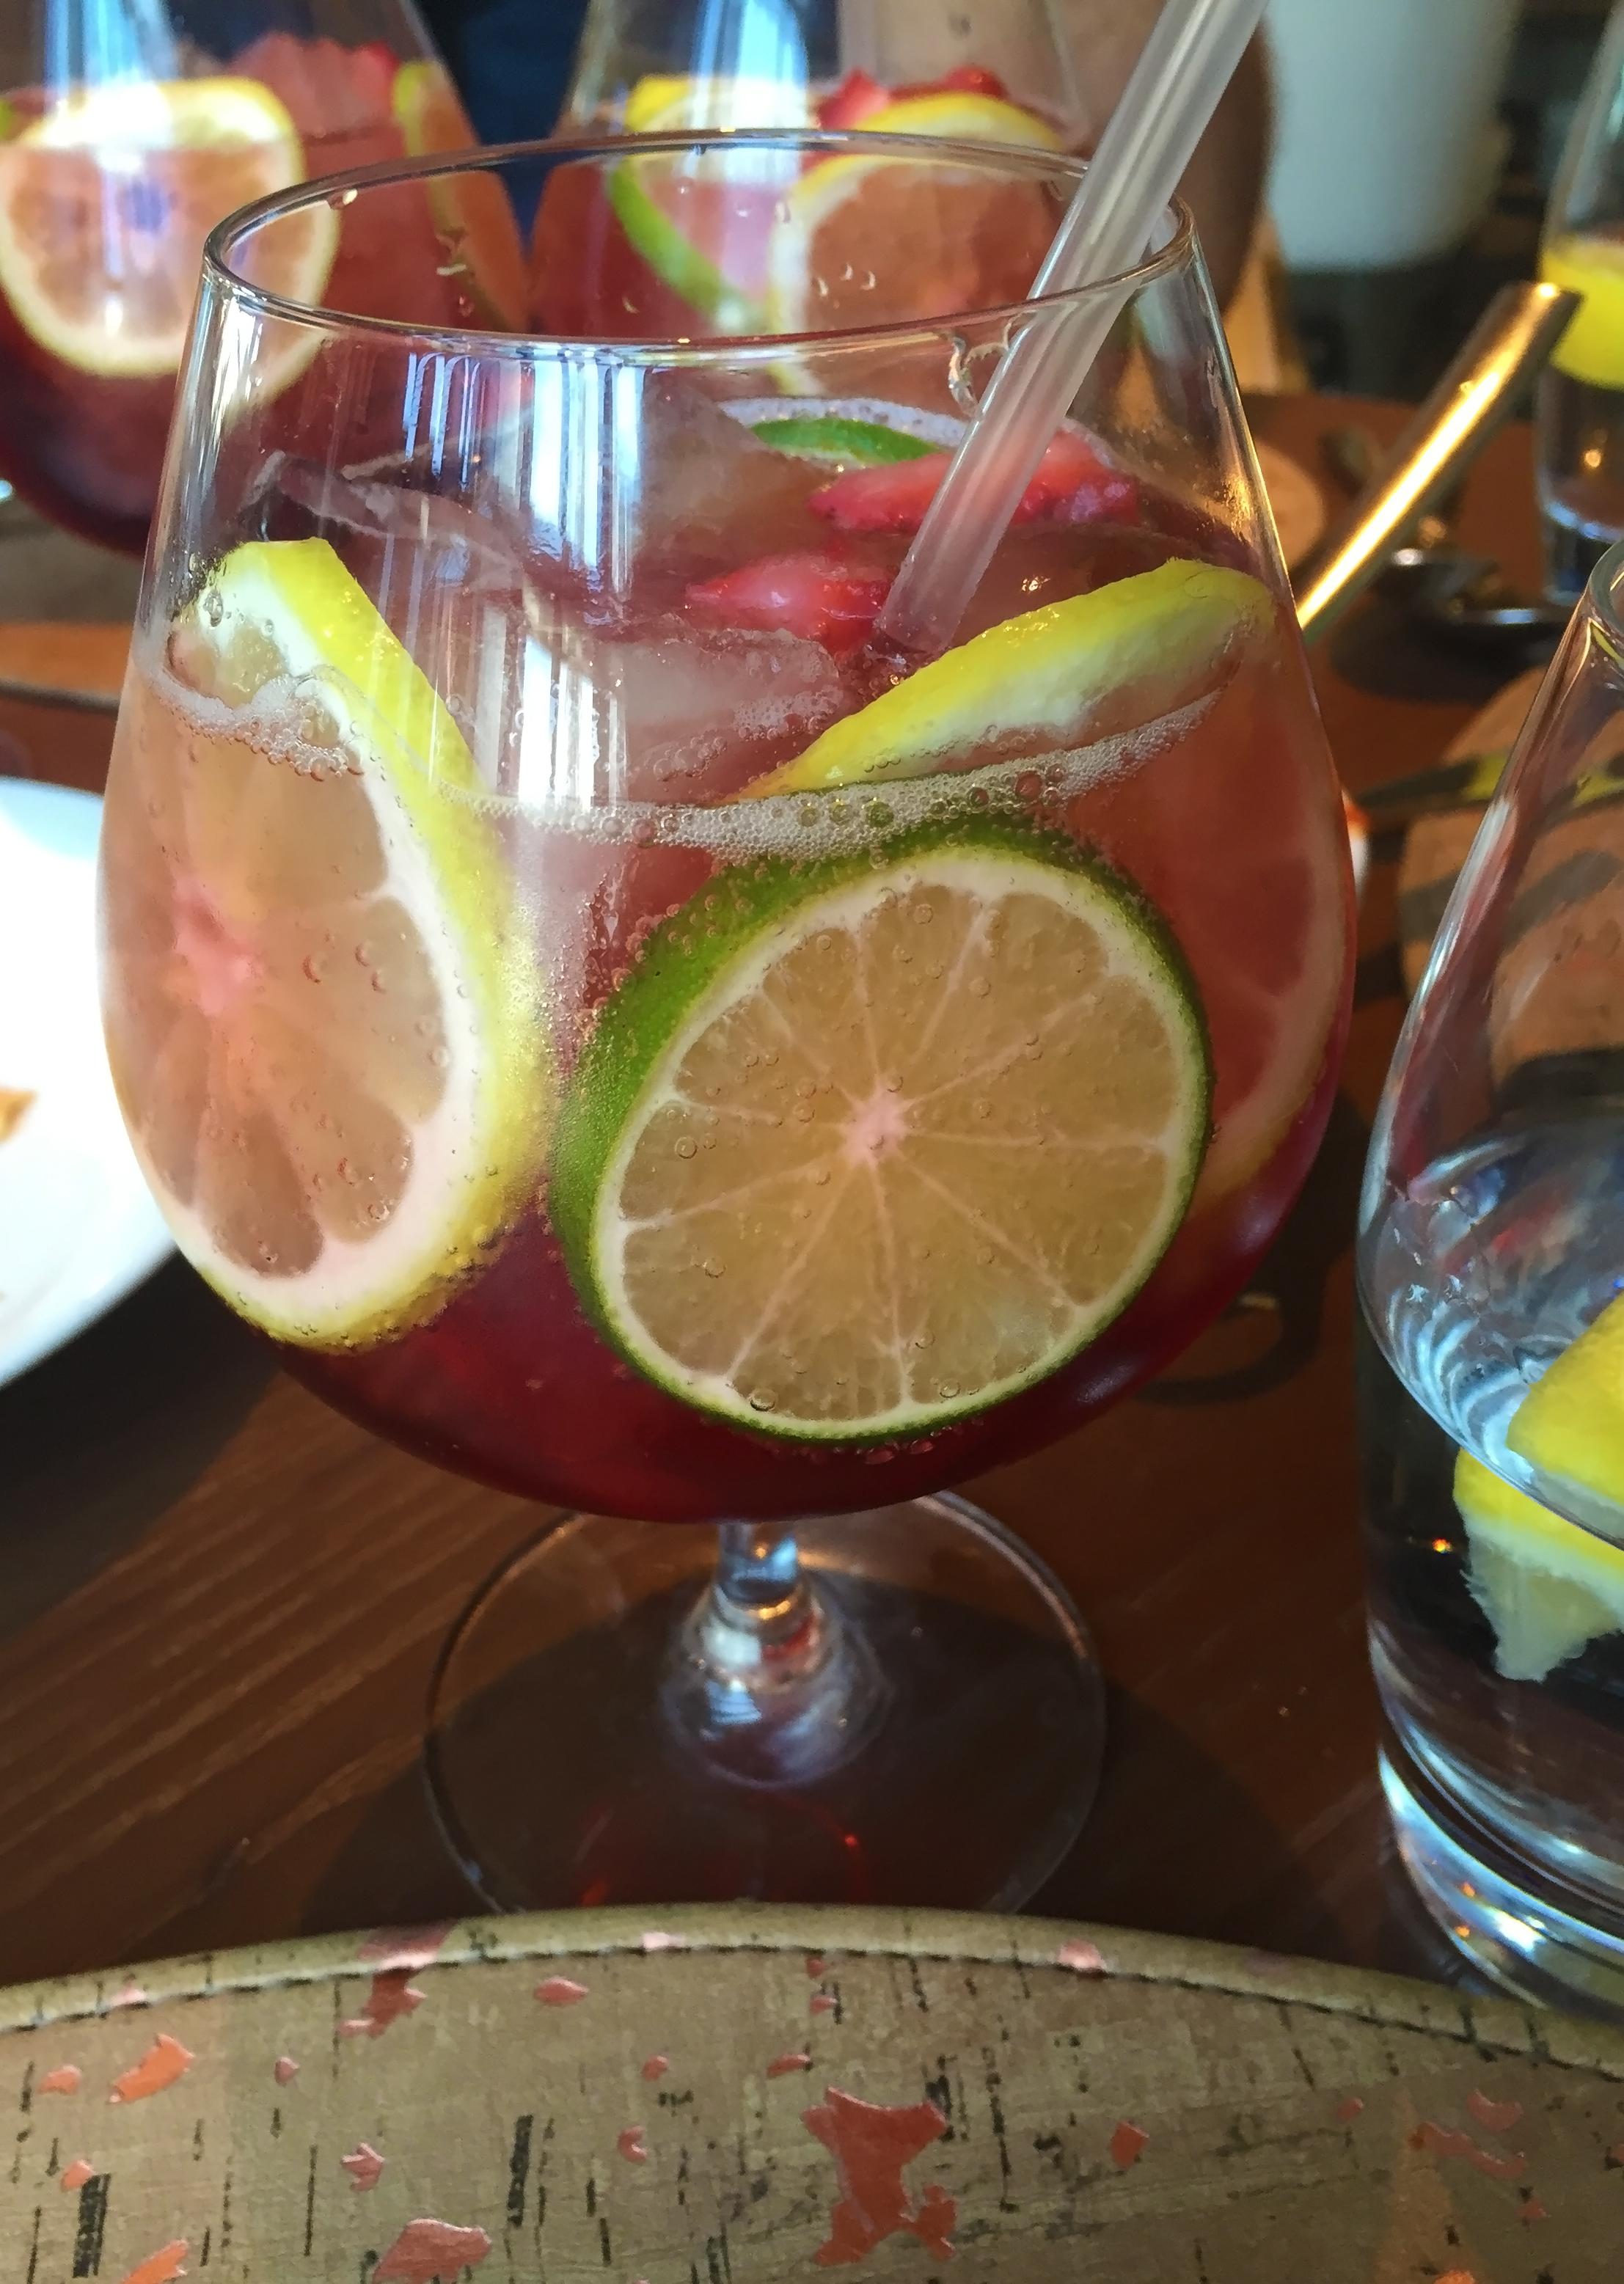 Giada's Sangria: Choice of Prosecco or Brachetto d'Acqui - fresh lemon, lime, strawberries, mojito mint syrup